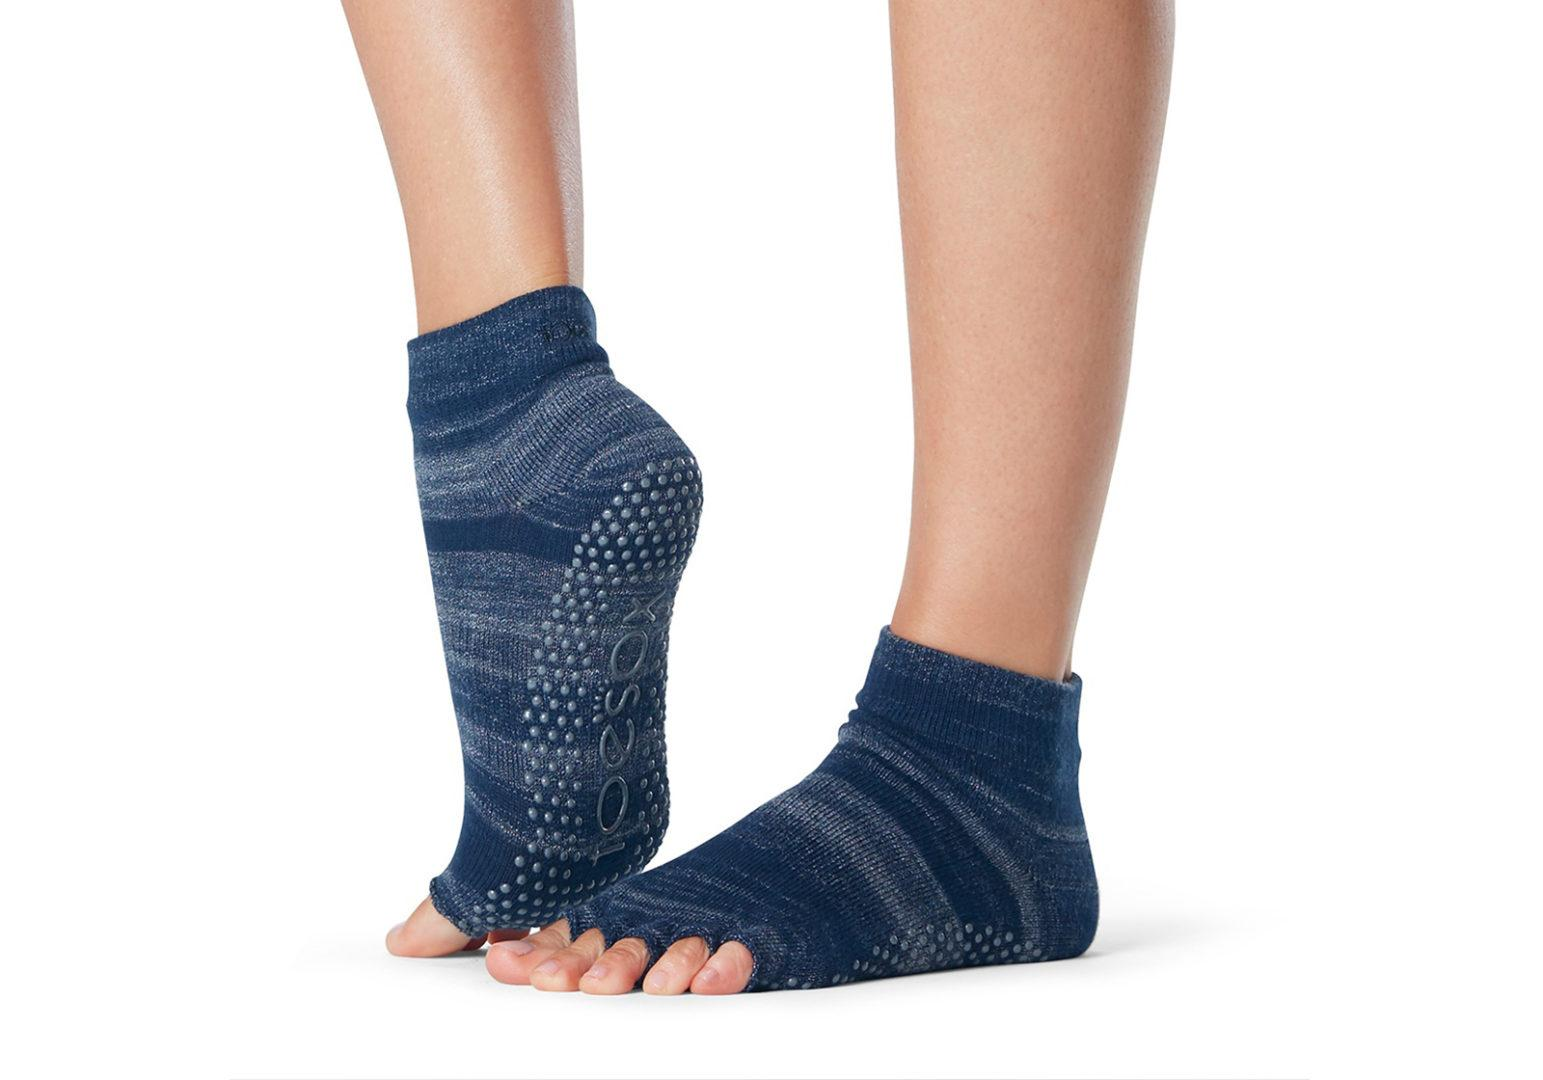 Toe-Sox-Socks_Grip_Ankle_Half_Toe_Nebula.jpg